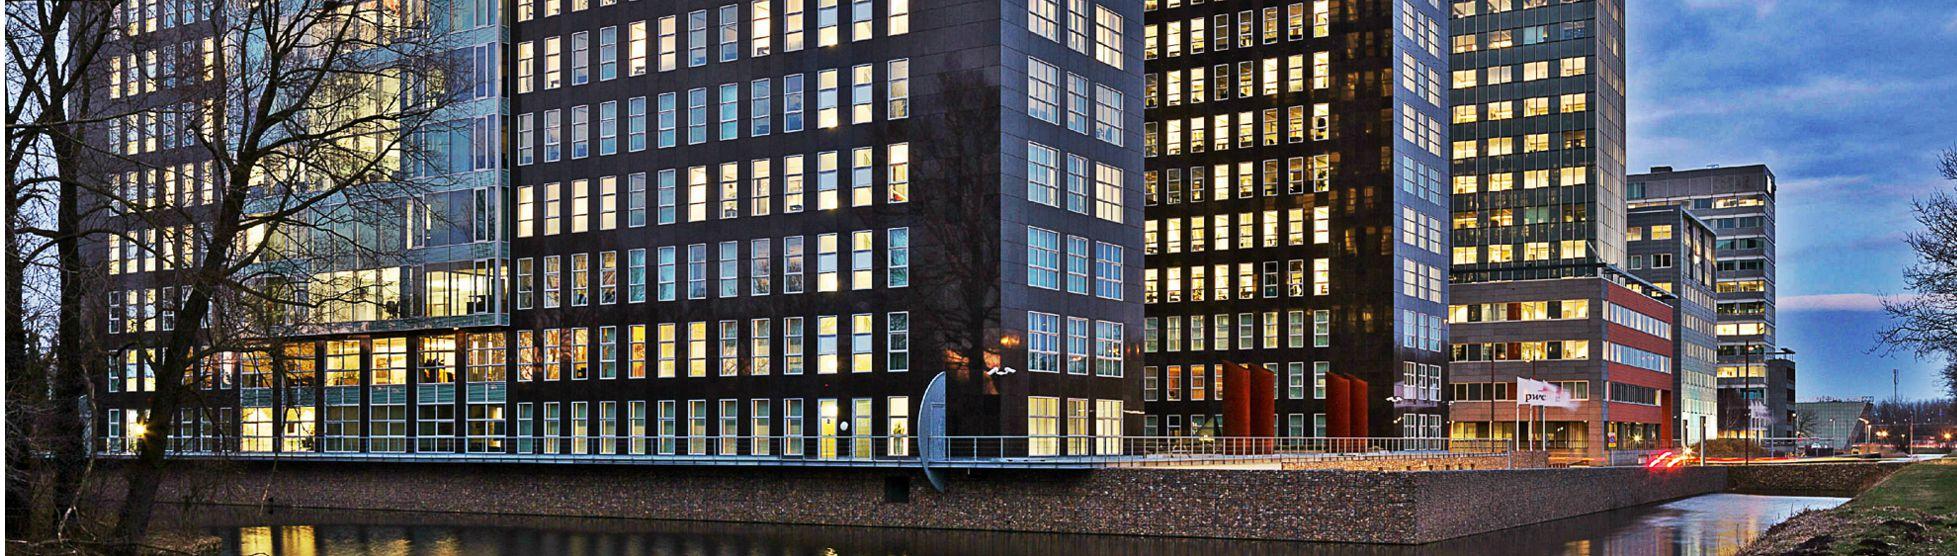 Price Waterhouse Coopers (PWC), Amsterdam